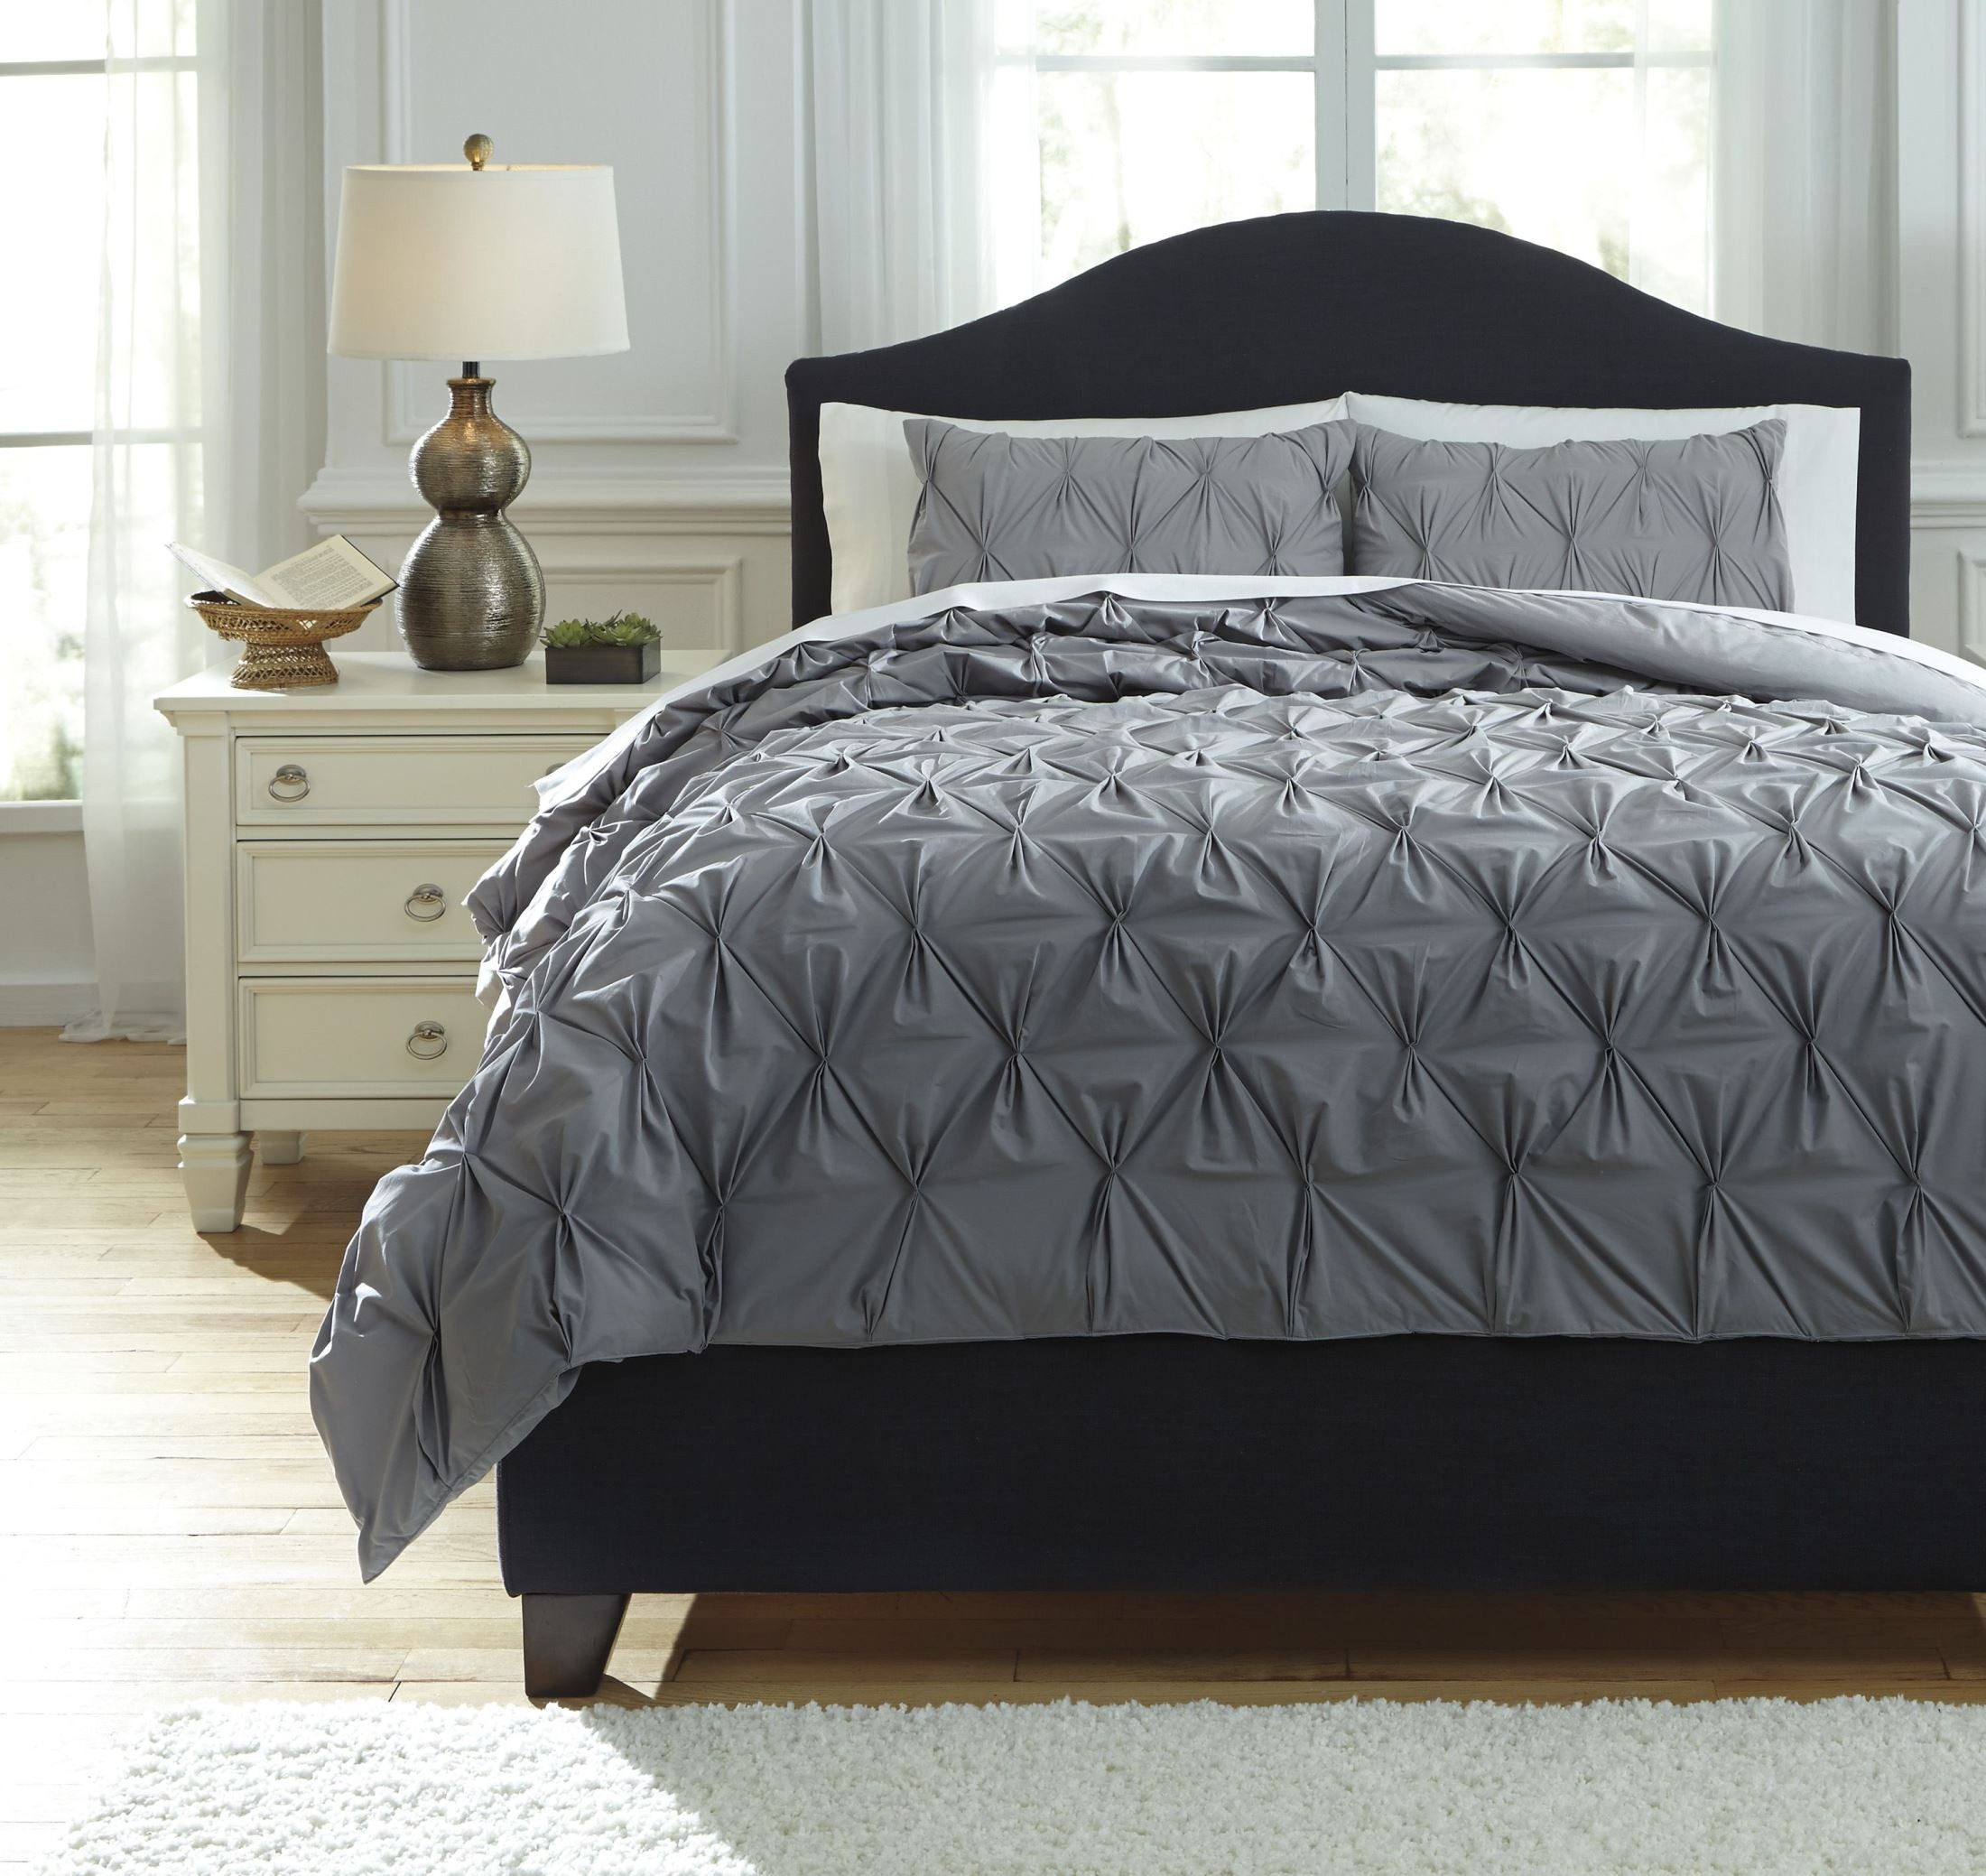 Ashley Furniture Cyrun Gray Queen Duvet Cover Set: Rimy Gray Queen Comforter Set From Ashley (Q756023Q